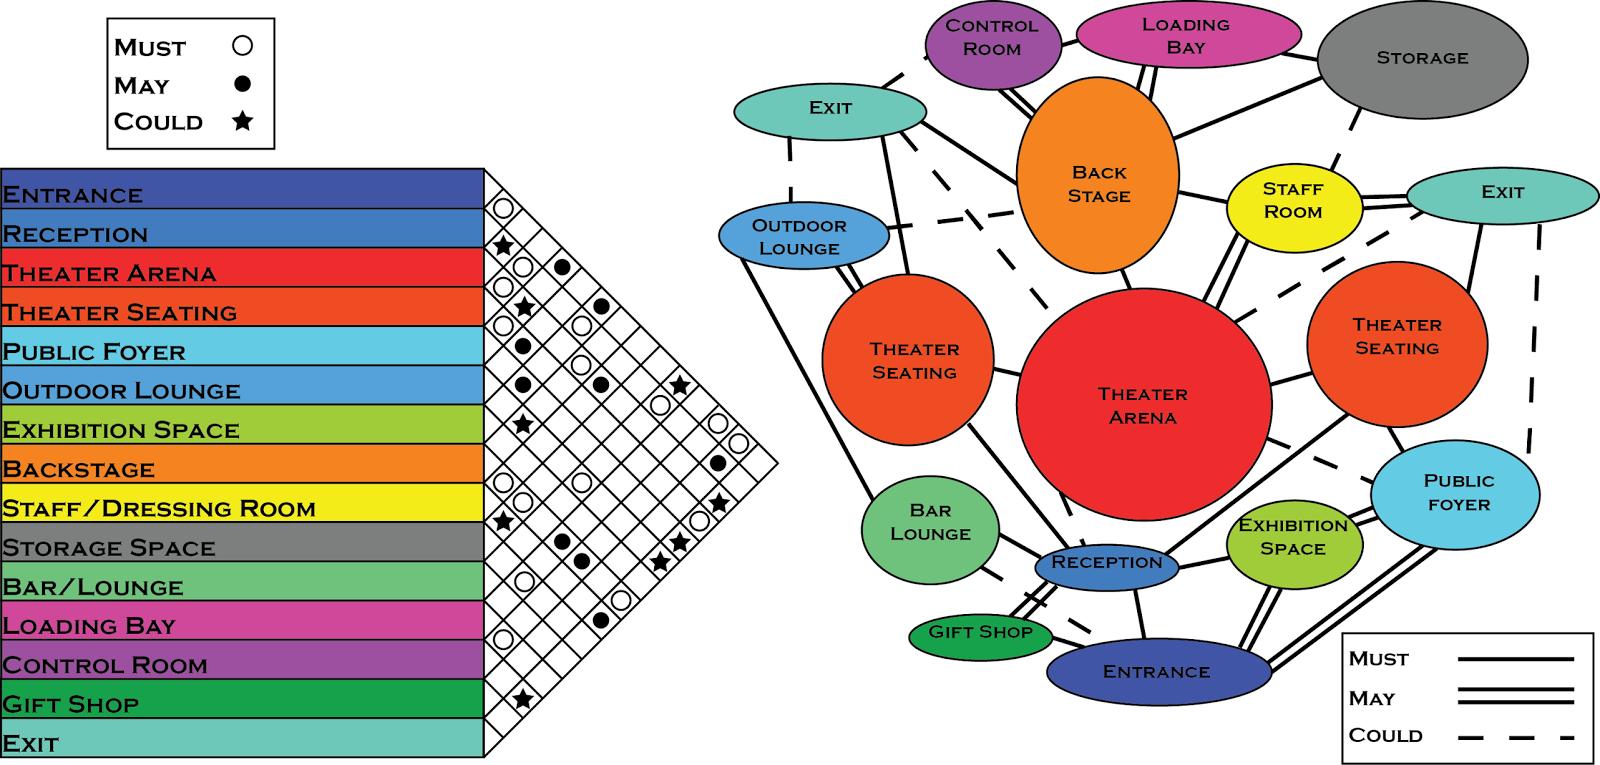 arch fall kadrakunov erjan  assignment    matrix    assignment    matrix  amp  bubble diagrams